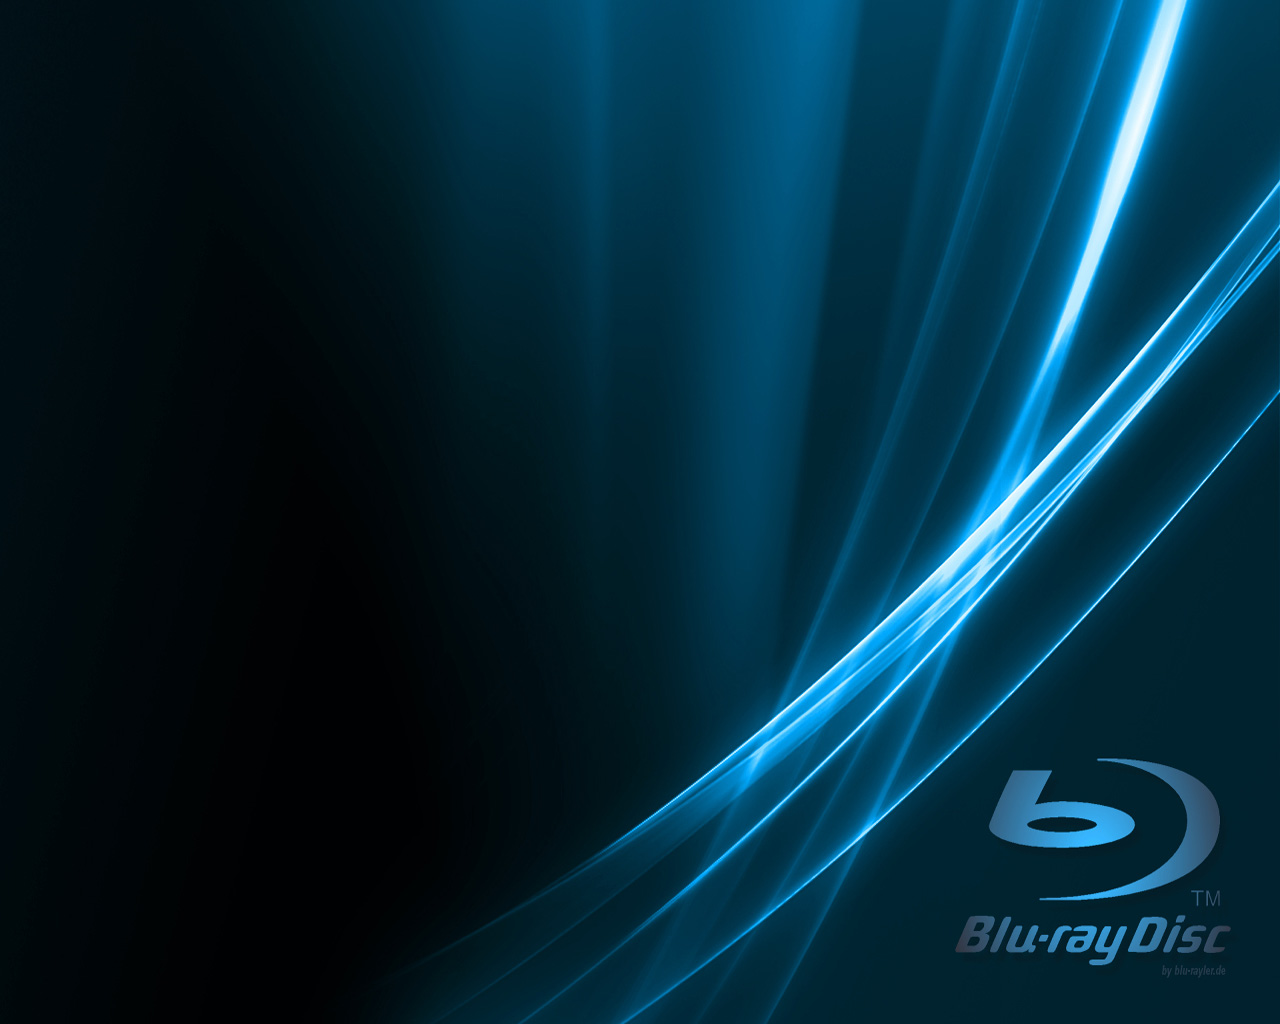 http://1.bp.blogspot.com/-oB77oglXMz0/ToQqndhu0yI/AAAAAAAAACE/0cZ922wZ860/s1600/Blu+Ray+Wallpapers+%25288%2529.jpeg